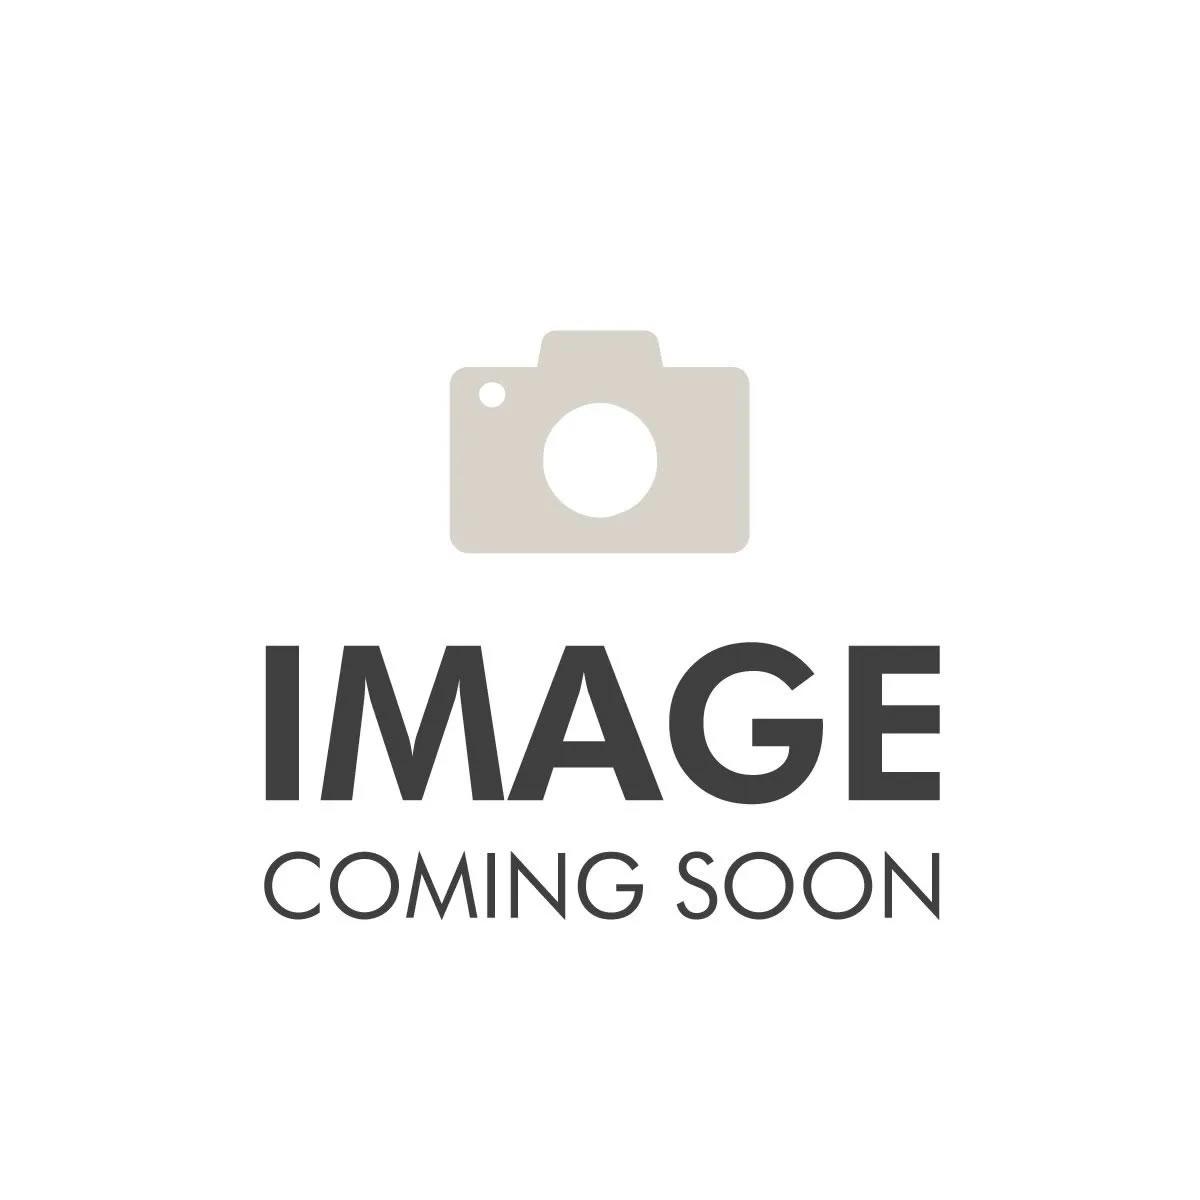 Defender Front Bumper, Stainless Steel; 55-06 Jeep CJ/Wrangler YJ/TJ